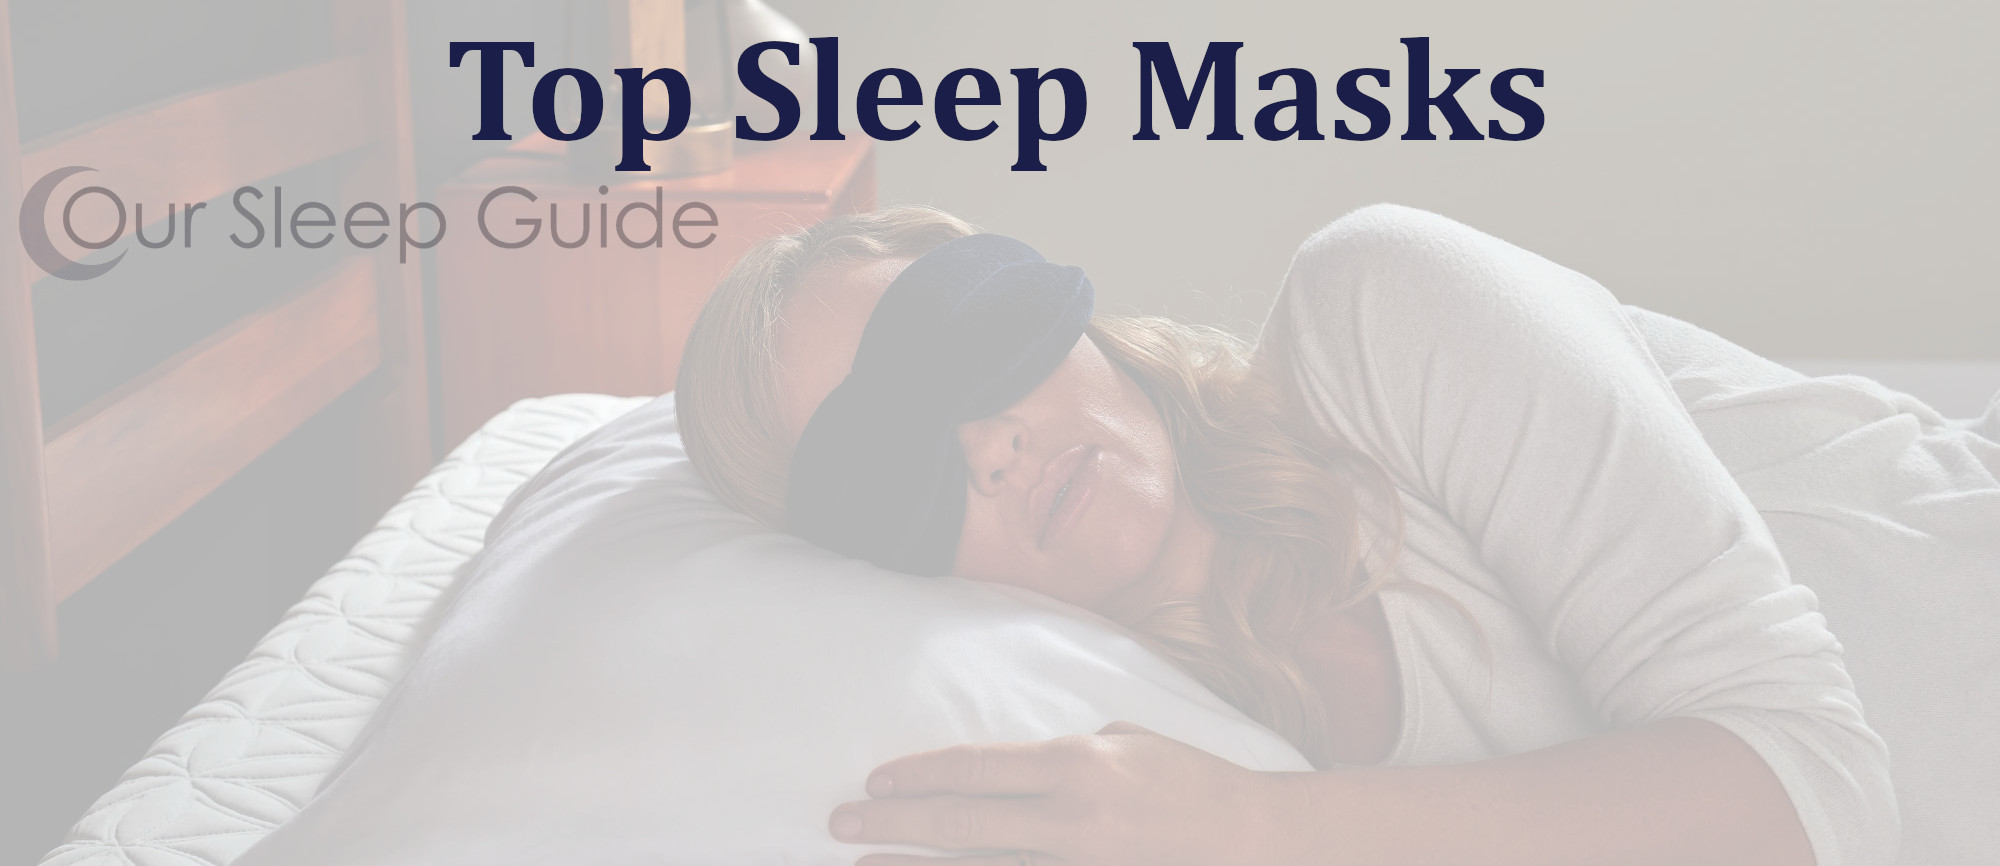 our sleep guide top sleep masks